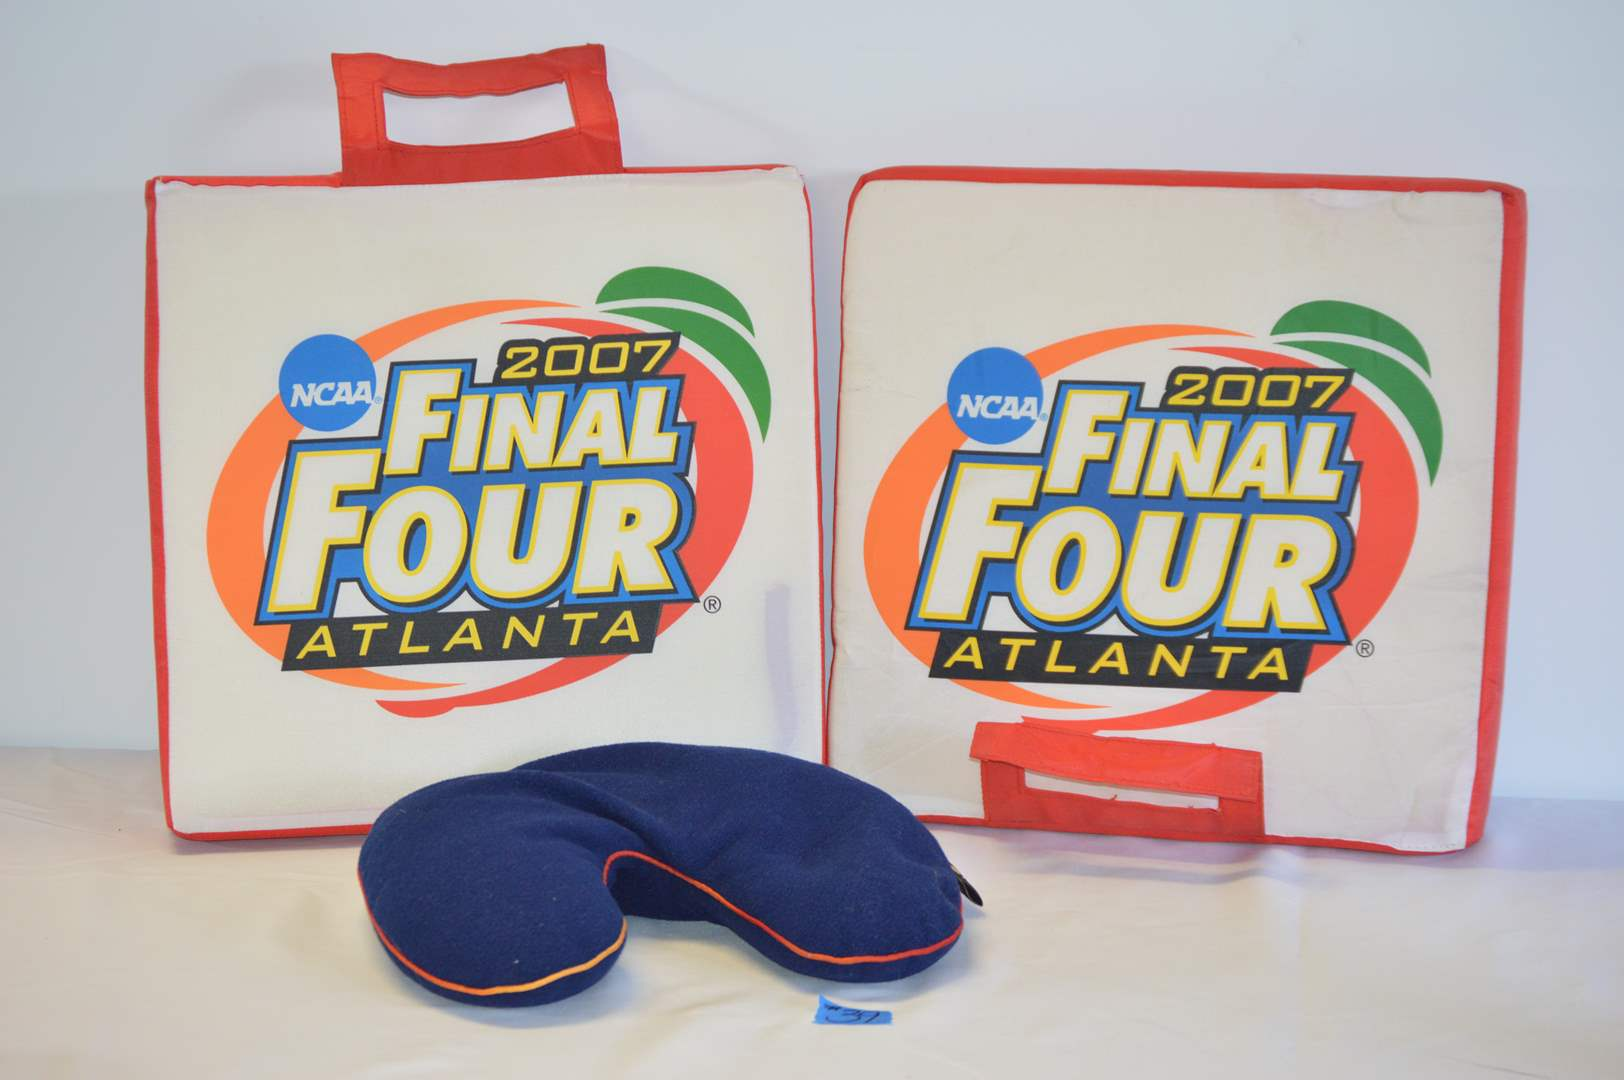 Lot # 39 Florida Gators Final Four bench cushions & Bucky neck pillow (main image)